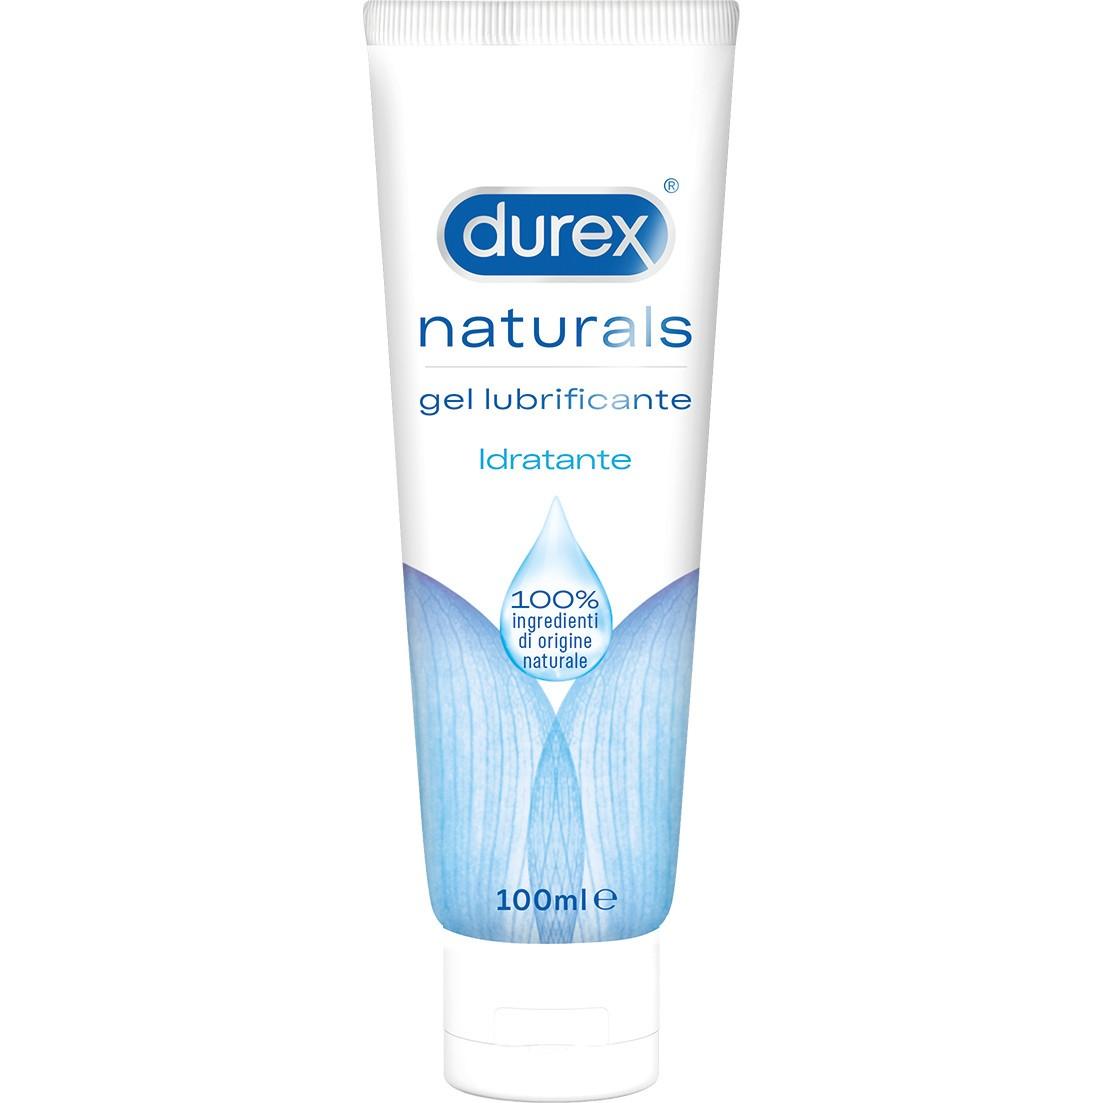 Durex Naturals Gel Lubrificante Idratante 100ml - Sempredisponibile.it